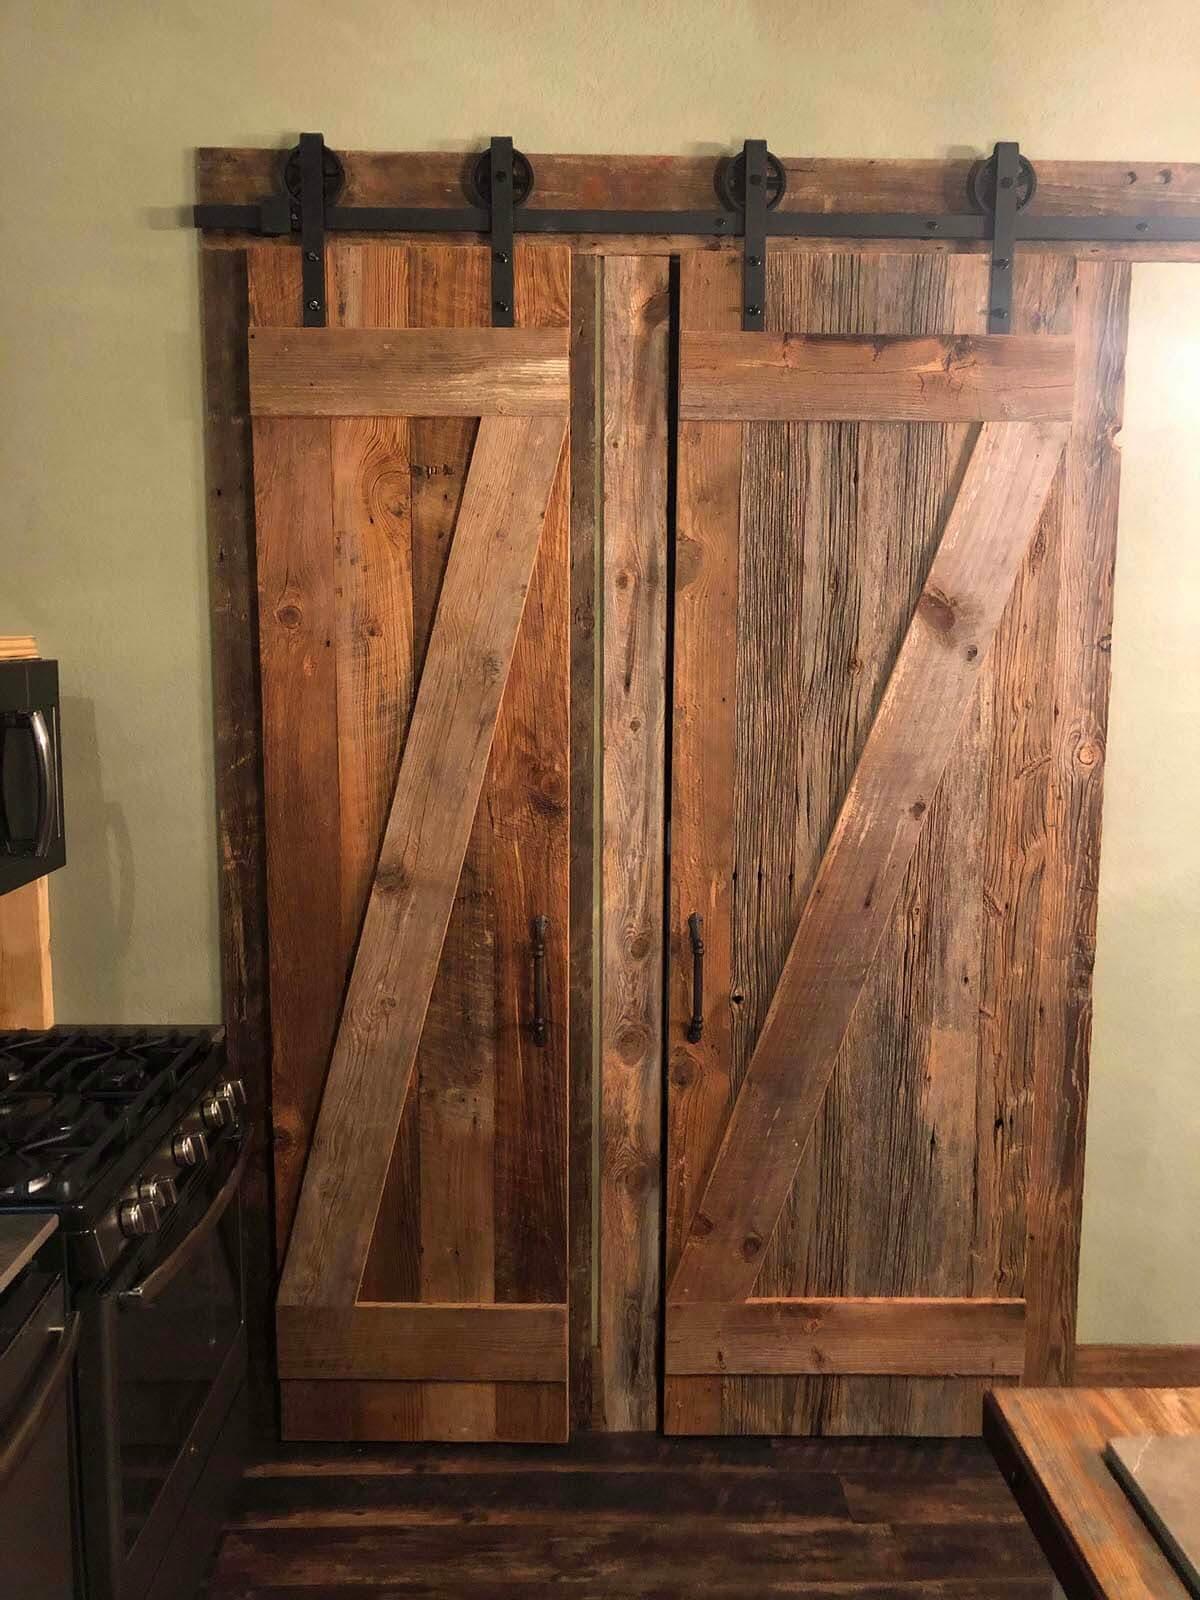 Rustic sliding barn door made from reclaimed wood.